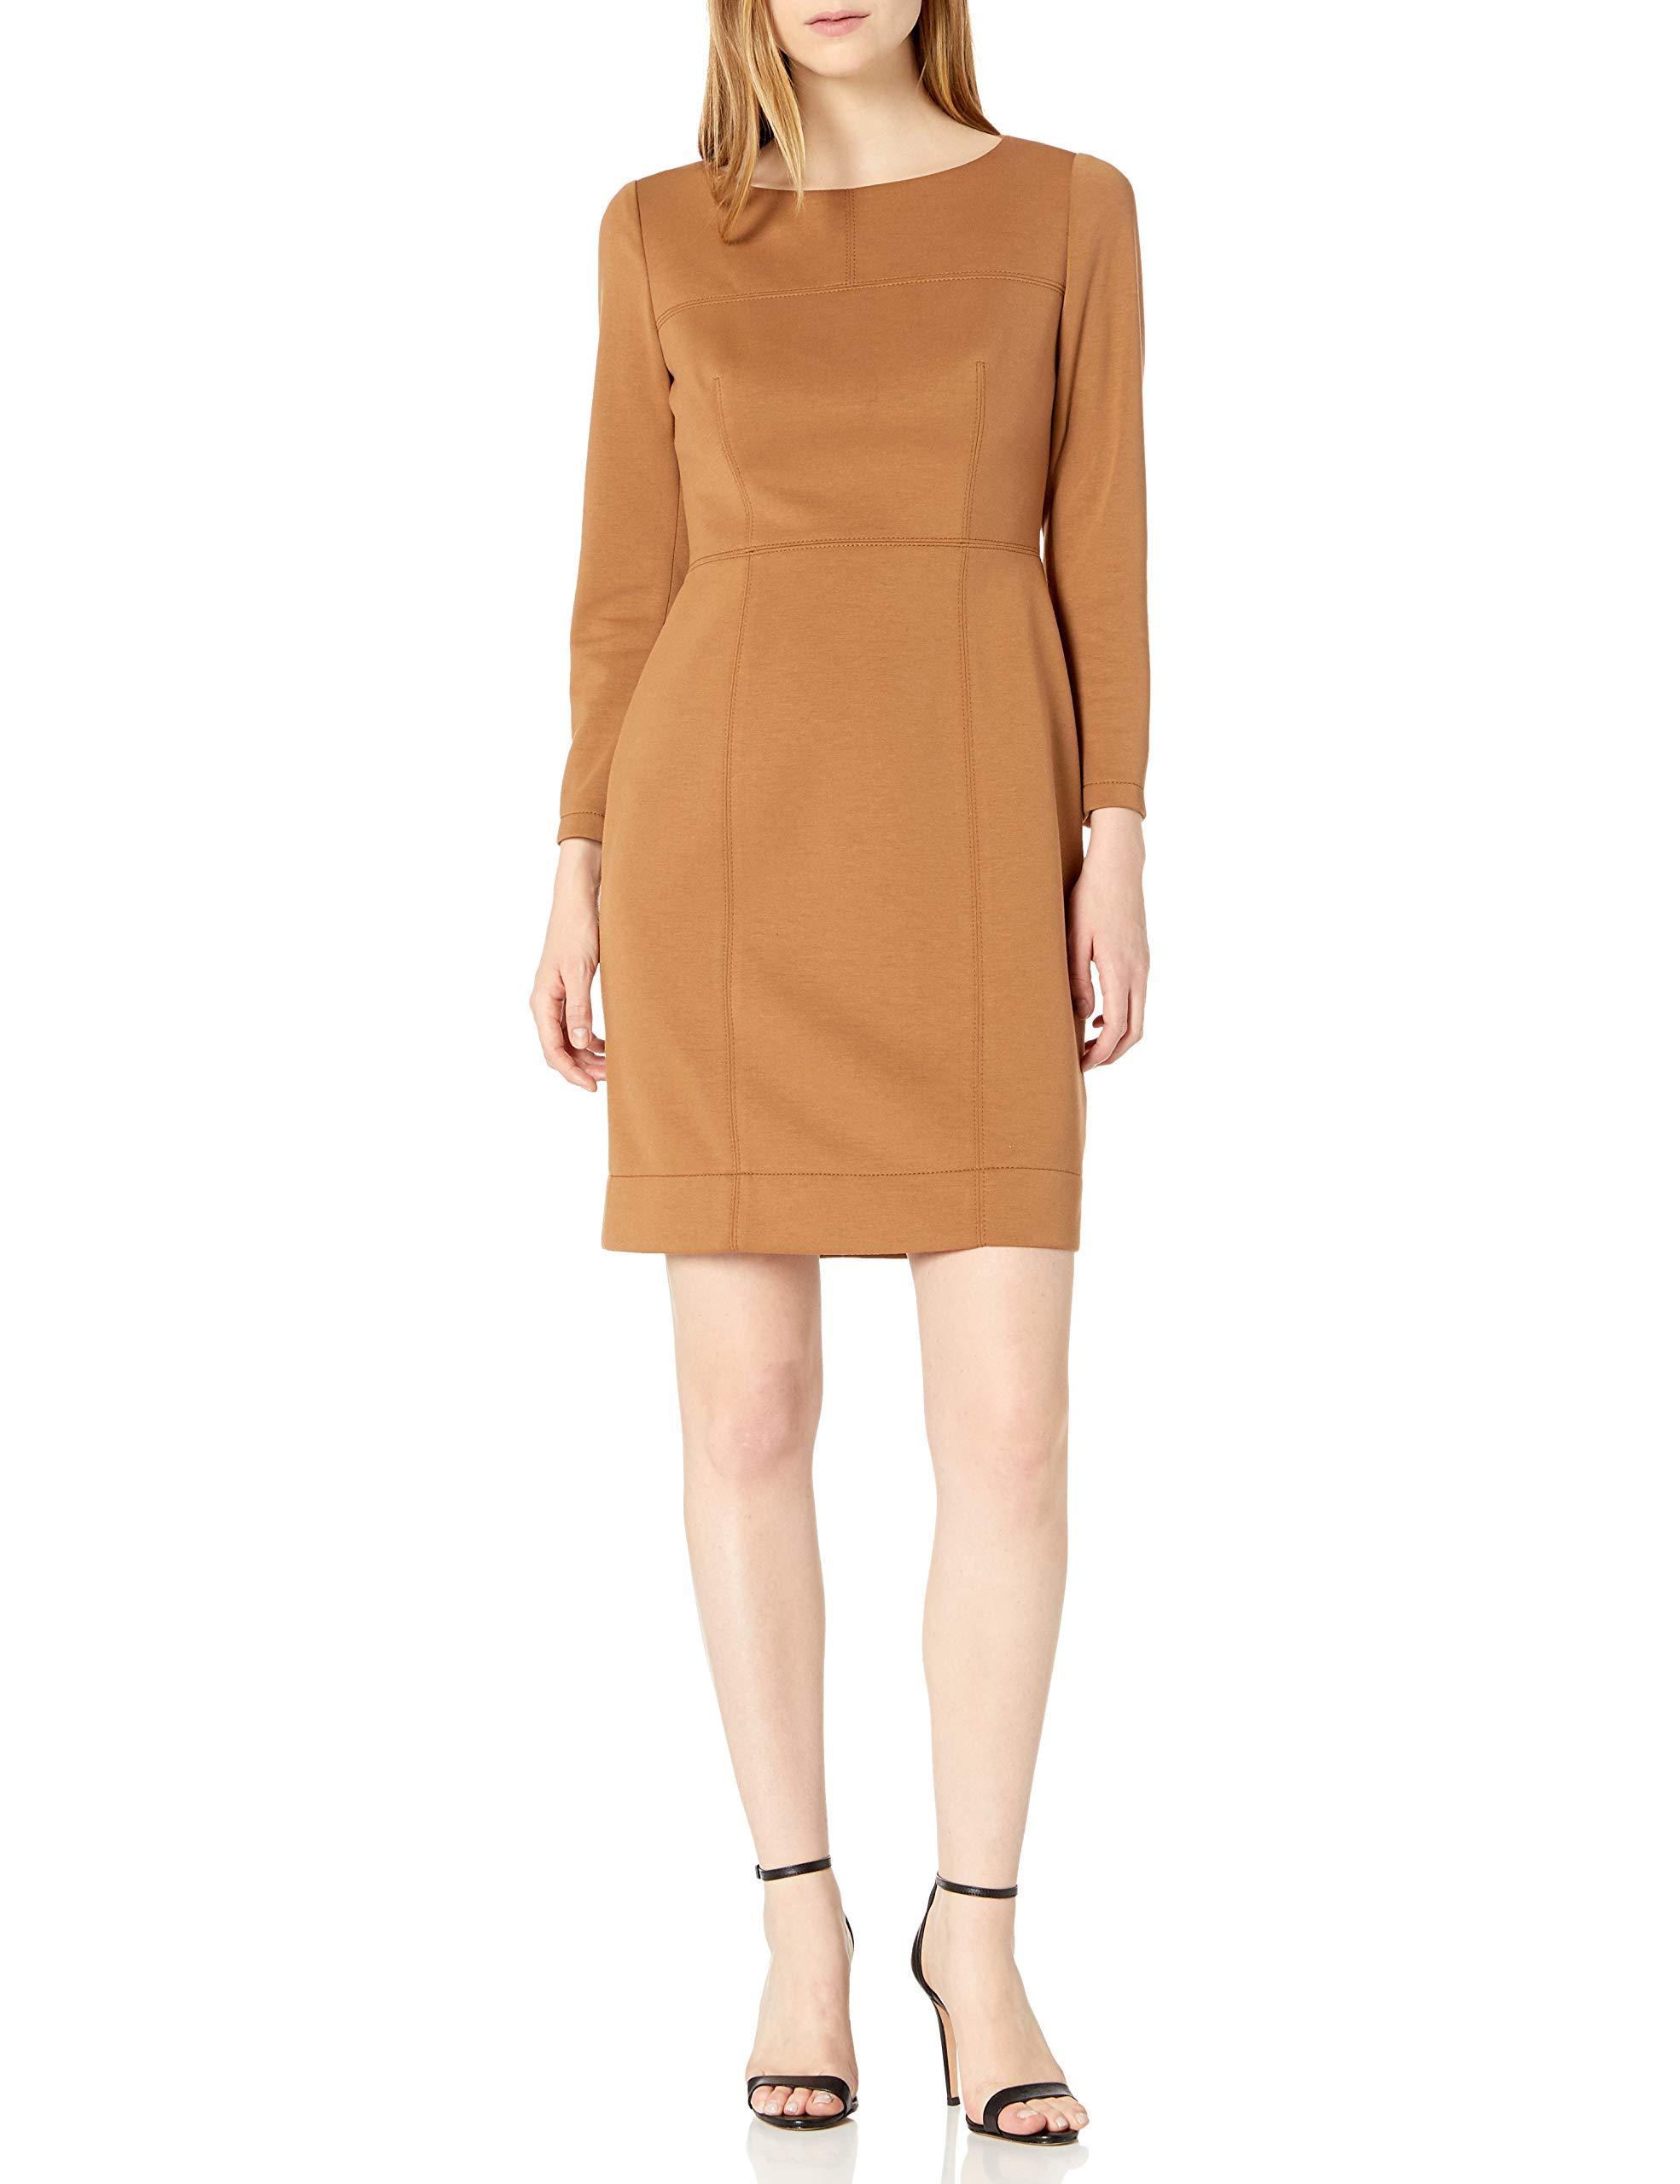 Available at Amazon: Anne Klein Women's Suede Scuba Sheath Dress